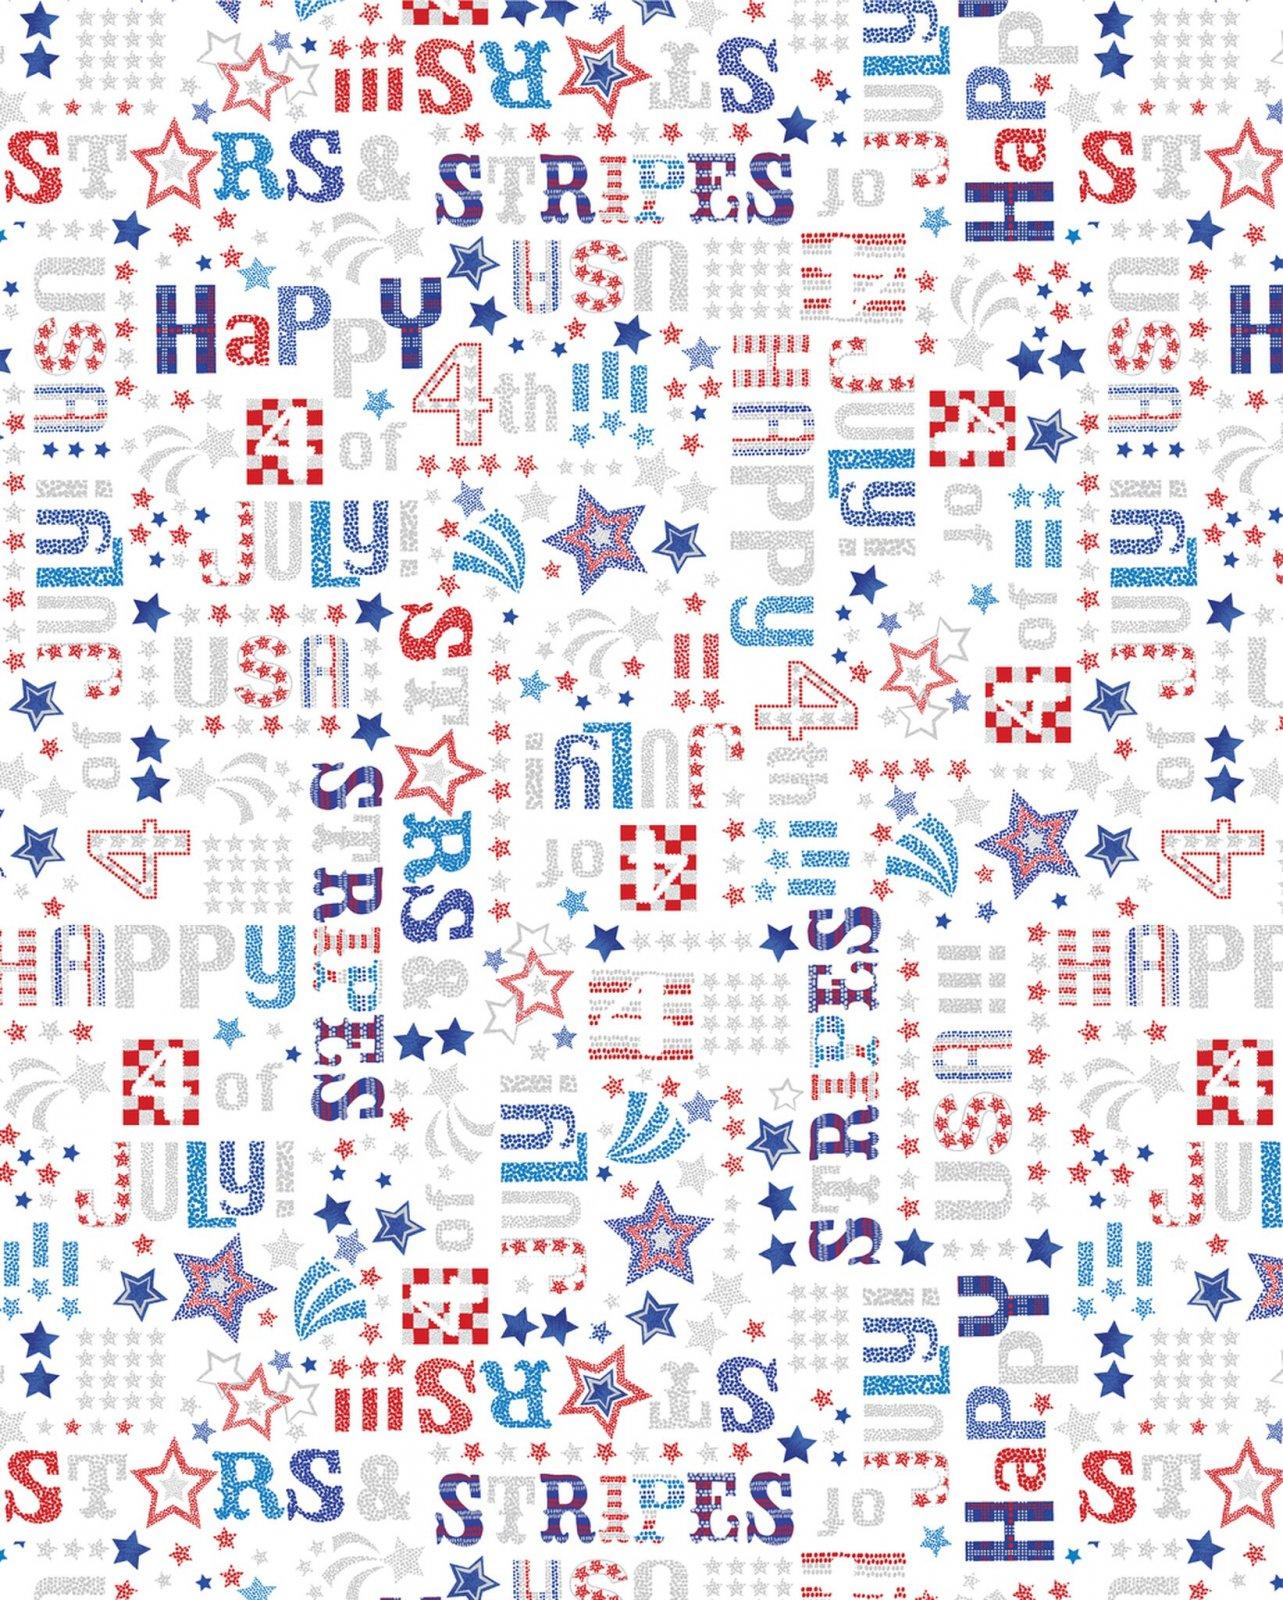 Star Spangled - Patriotic Words Metallic (White)